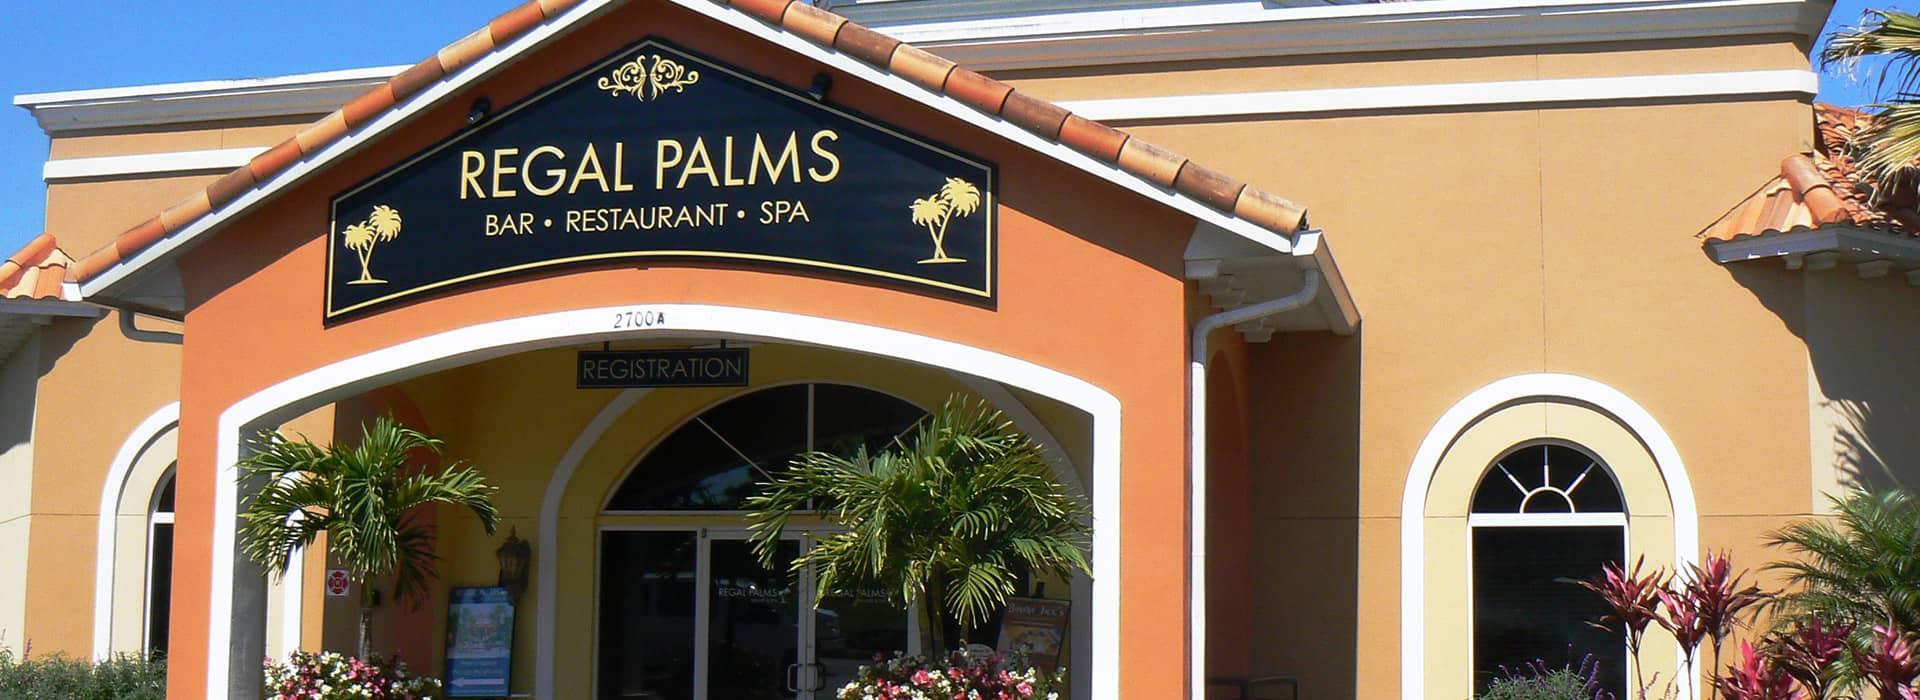 Regal Palms Resort Florida Regal Palms Resort Orlando